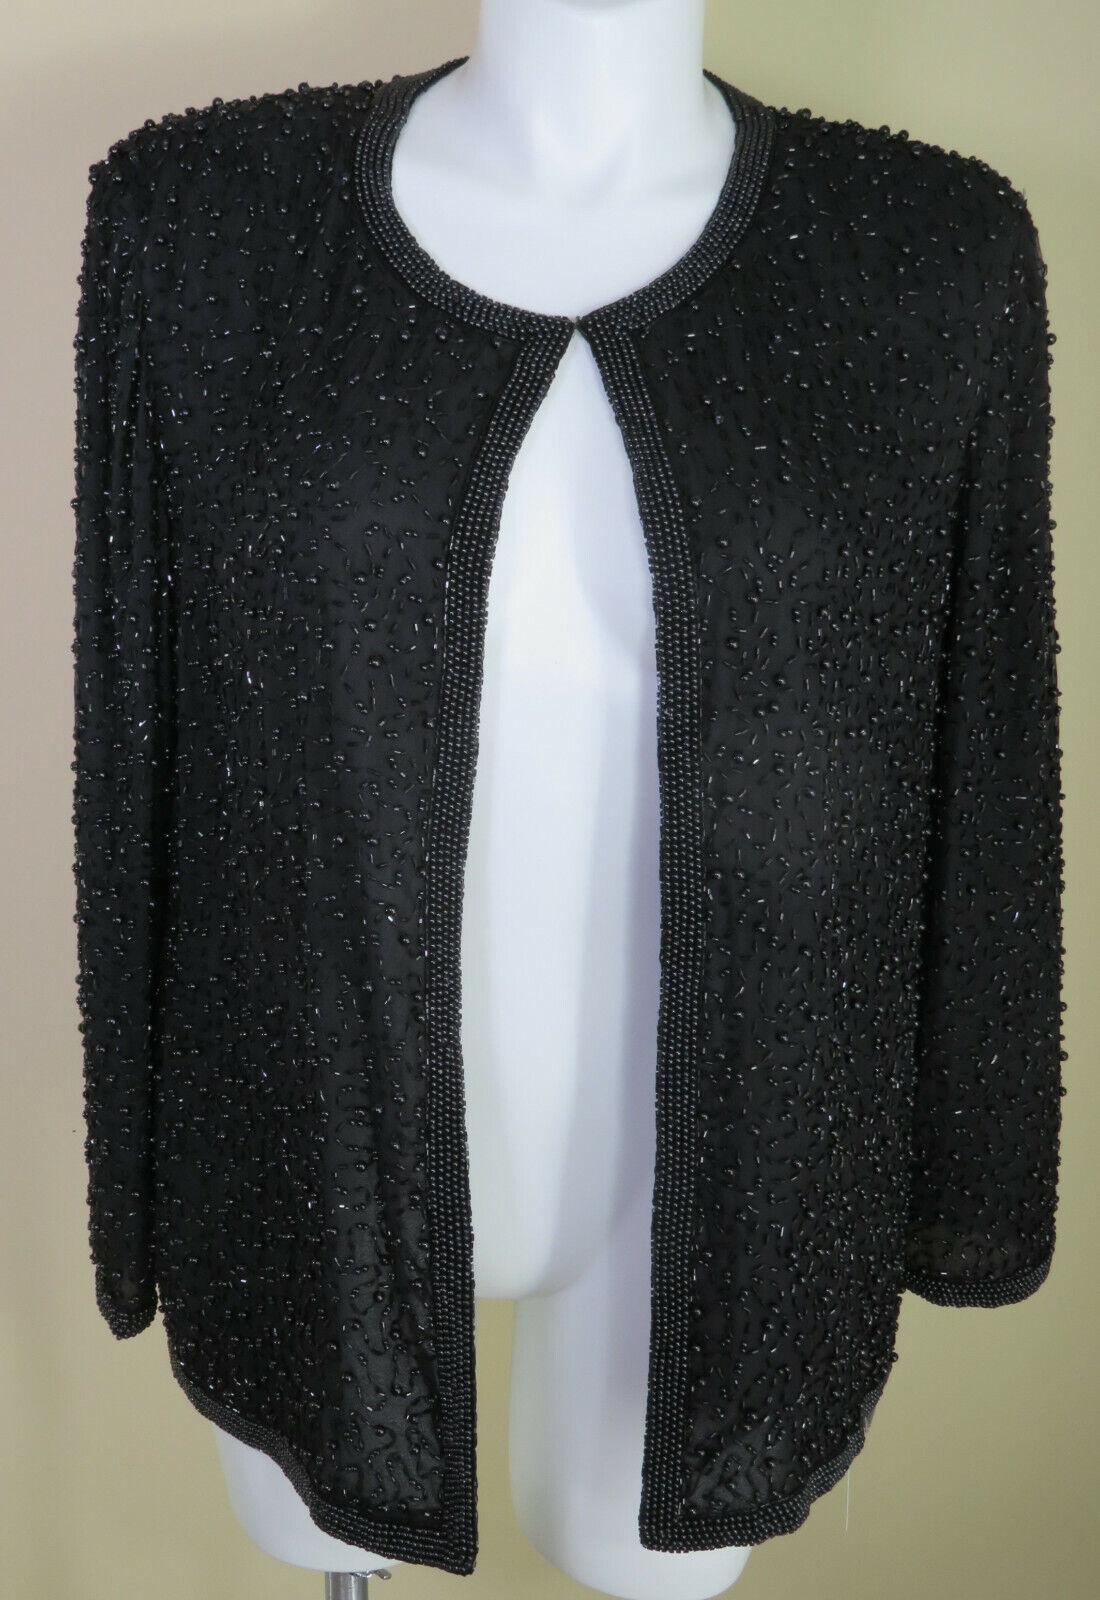 Vtg Cote d' Azur NWT L/Sleeve Black Silk Beaded Lined Jacket Size XL MSRP